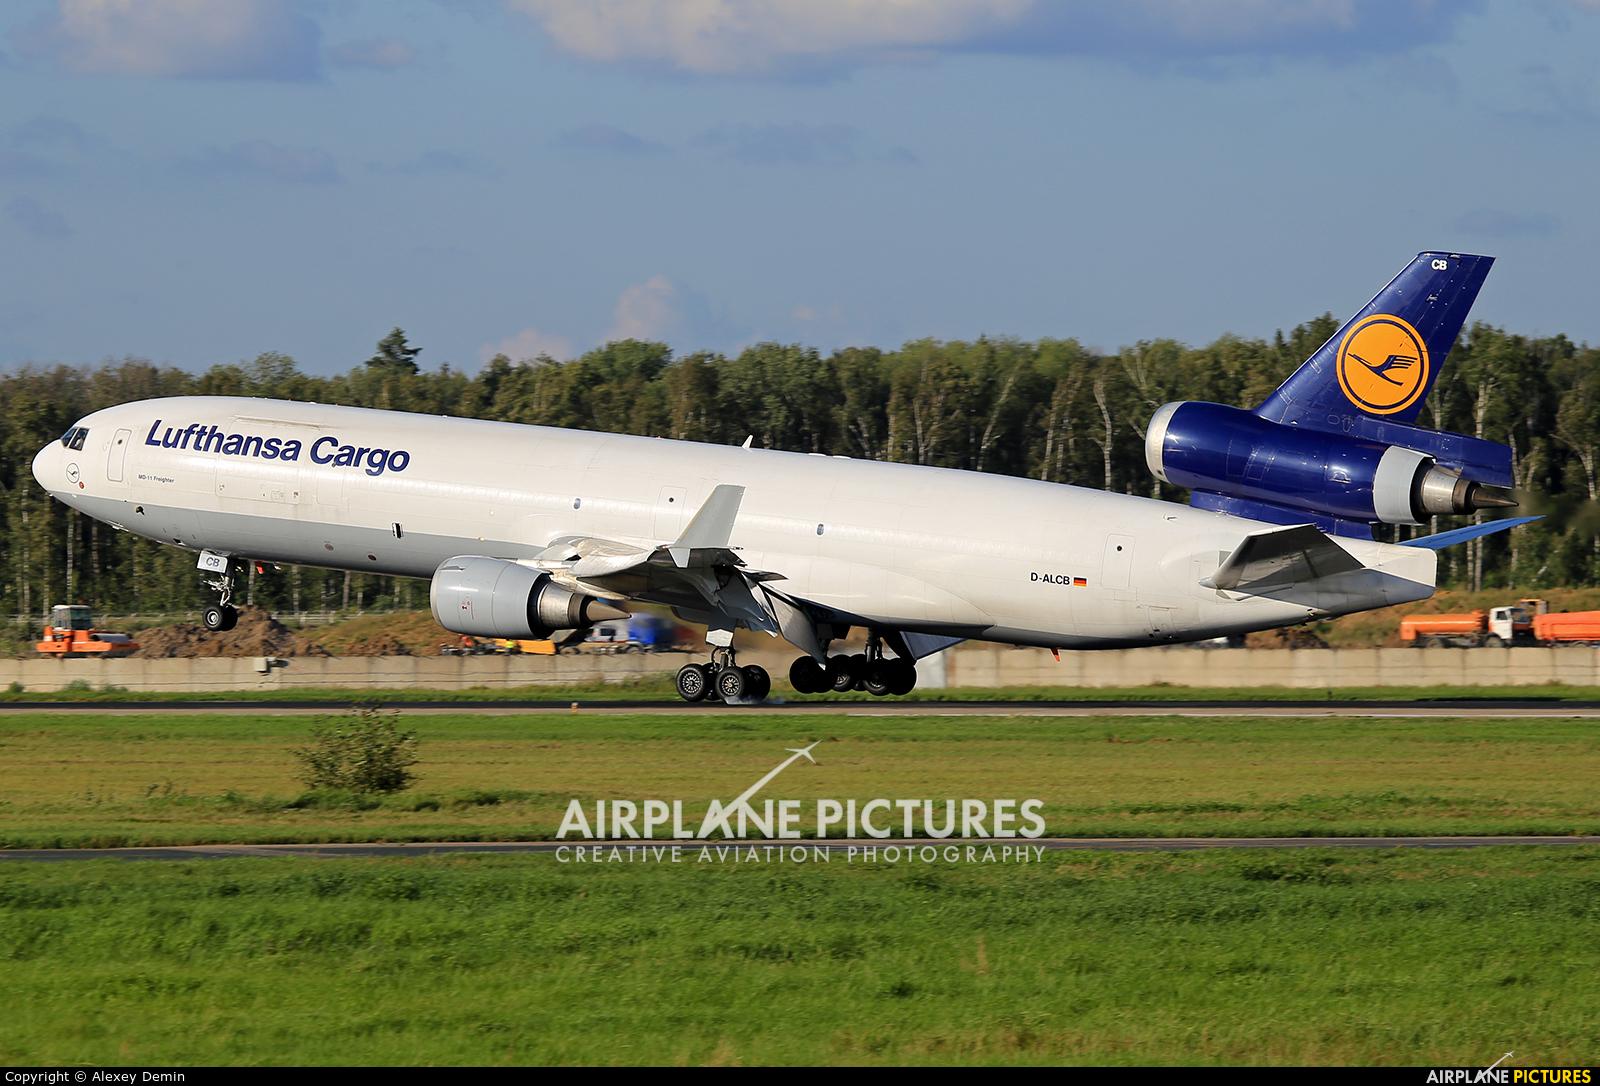 Lufthansa Cargo D-ALCB aircraft at Moscow - Domodedovo